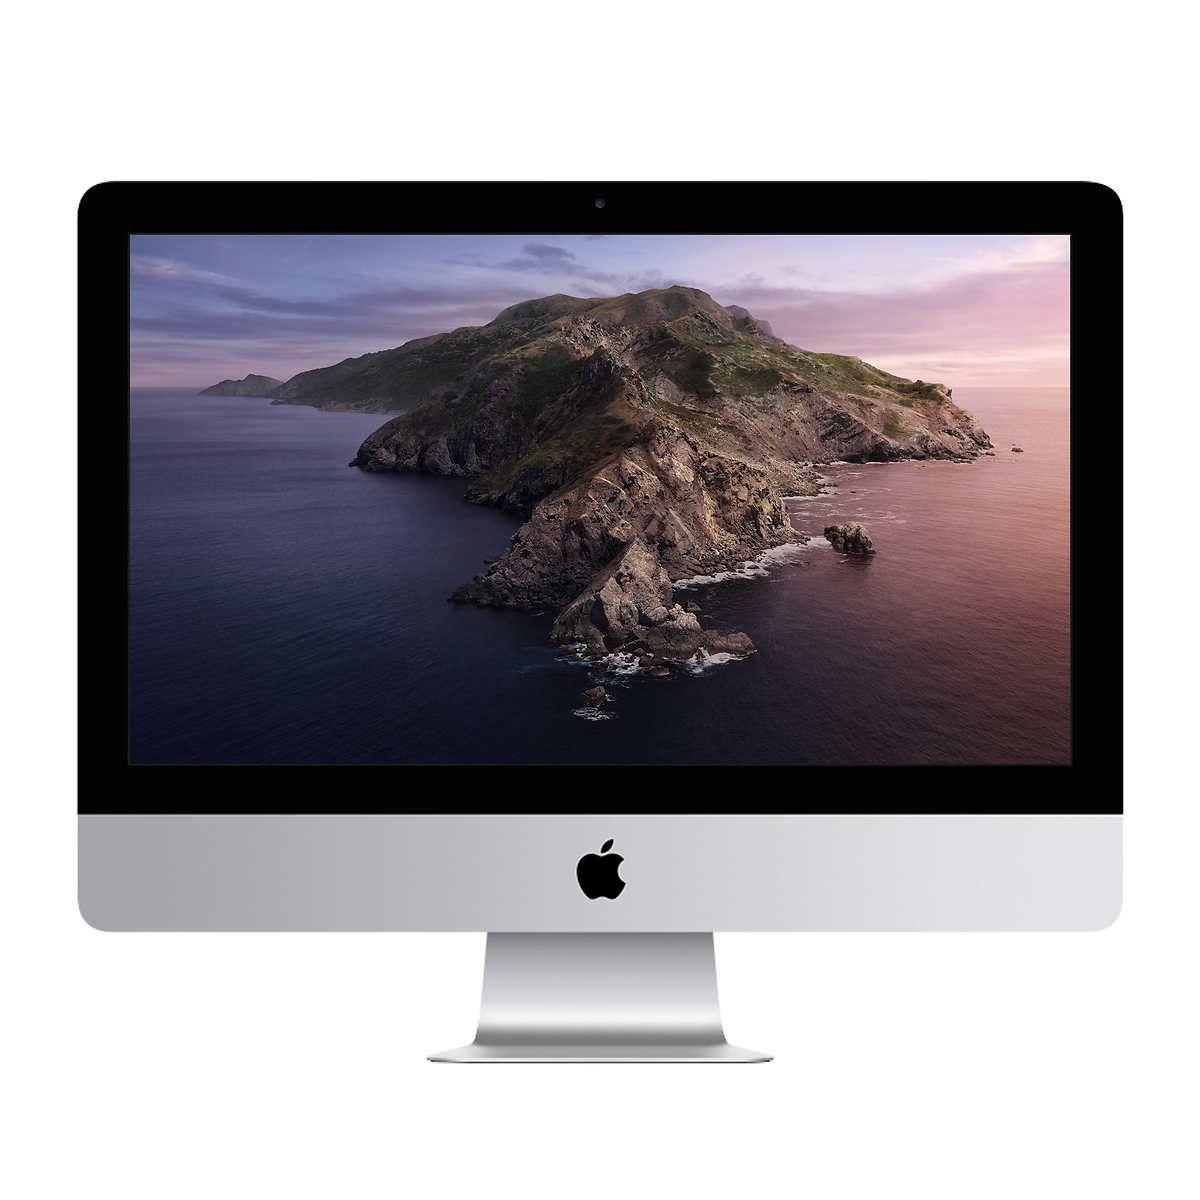 Apple Imac 21 5 Intel Core I5 8gb Memory 256gb Ssd In 2021 Imac All In One Pc Apple